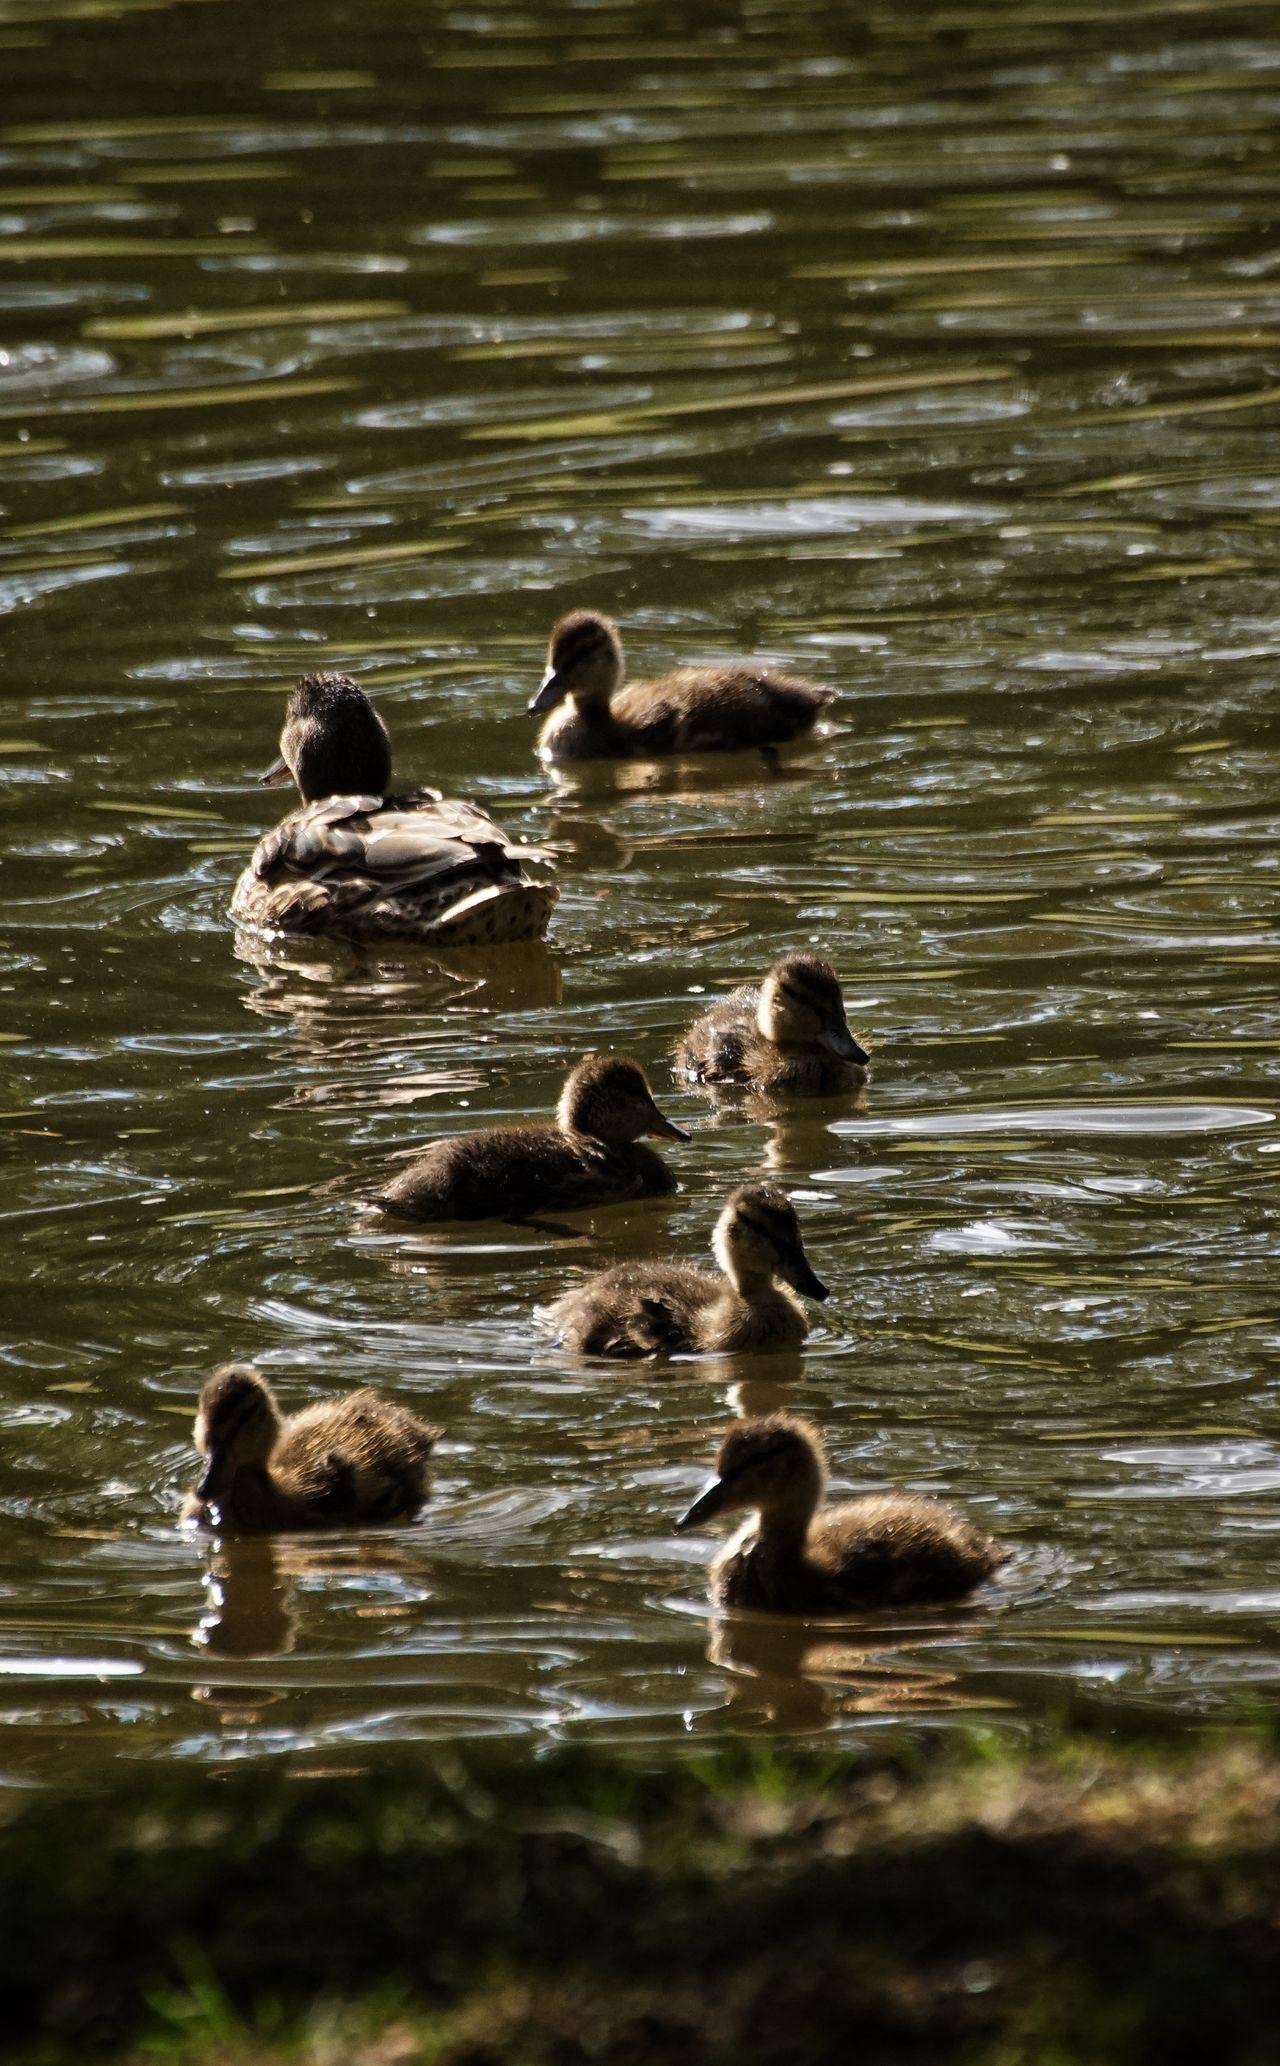 EyeEm Selects Hagaparken Showcase July 2017 Brunnsviken Animals In The Wild Water Animal Wildlife Animal Themes Swimming Outdoors Nature Mallard